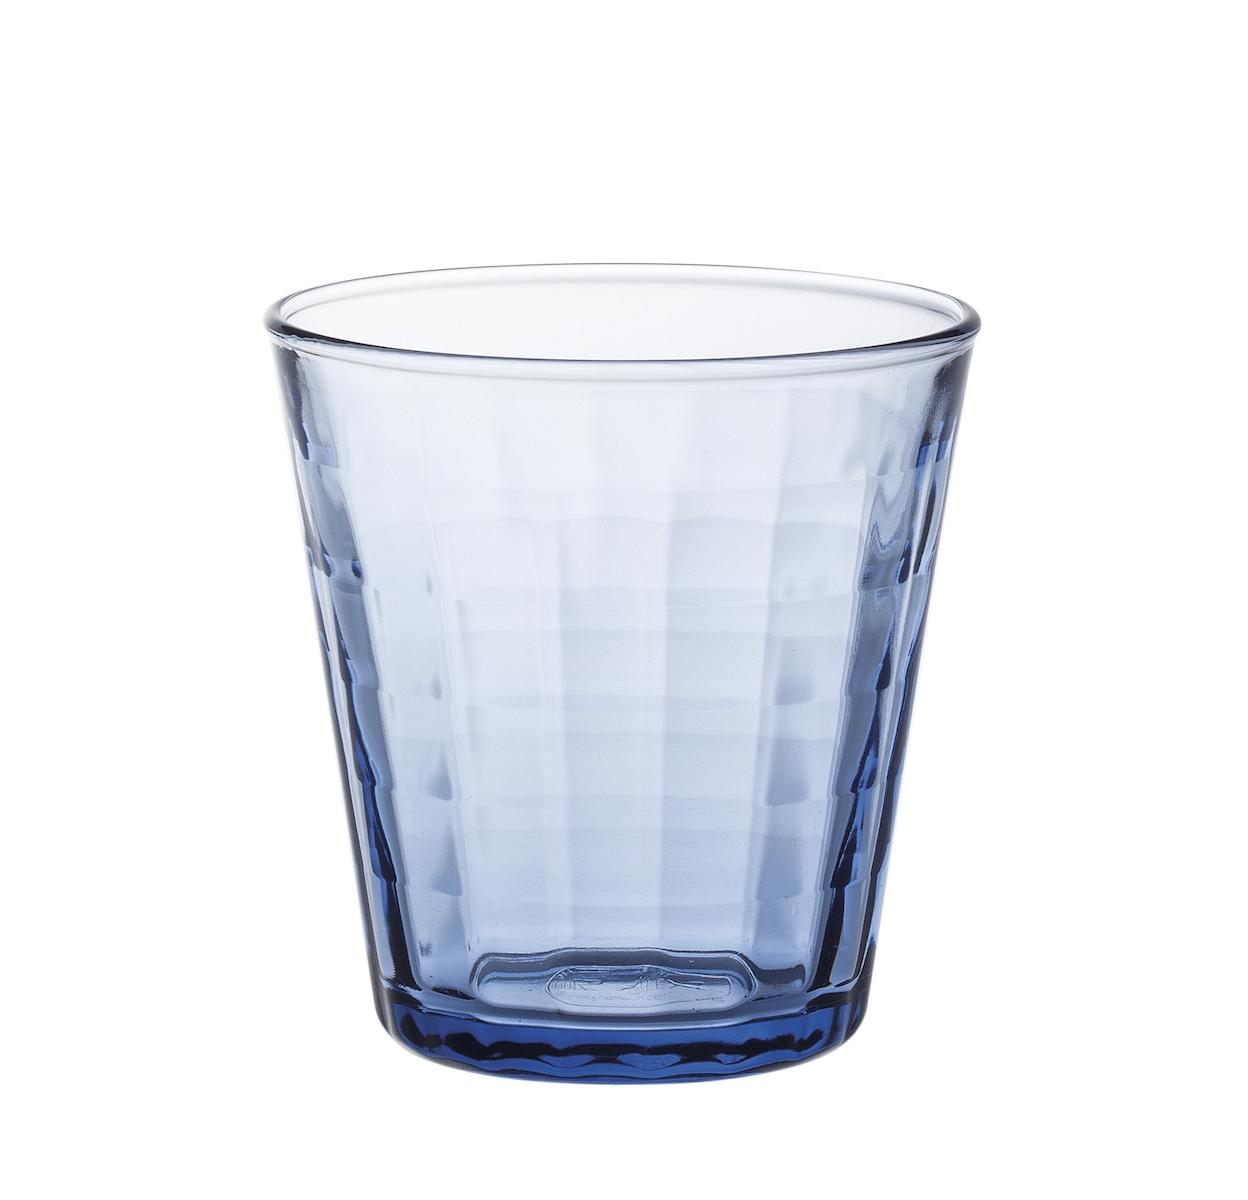 DURALEX デュラレックス プリズム マリン 170ml フランス グラス 透明 セール 激安通販専門店 30%off 割引 30%OFF 電子レンジ 食器 カフェ 全面耐熱 食洗機 強化ガラス SALE !超美品再入荷品質至上!